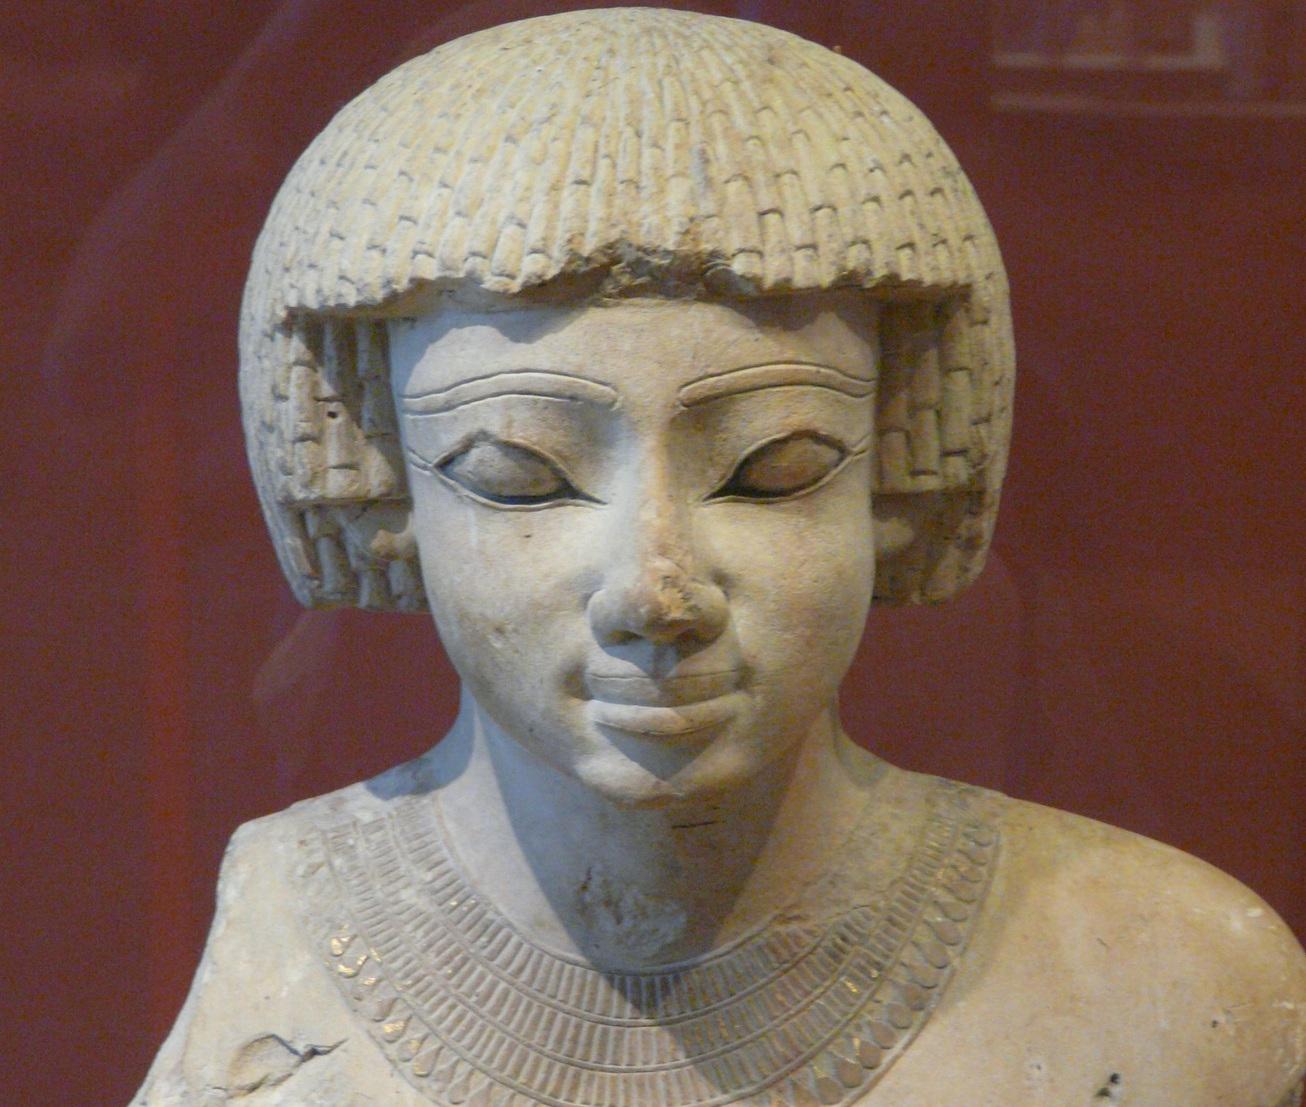 Статуя Ахмосе I, основателя XVIII династии. Лувр, Париж. «Википедия»